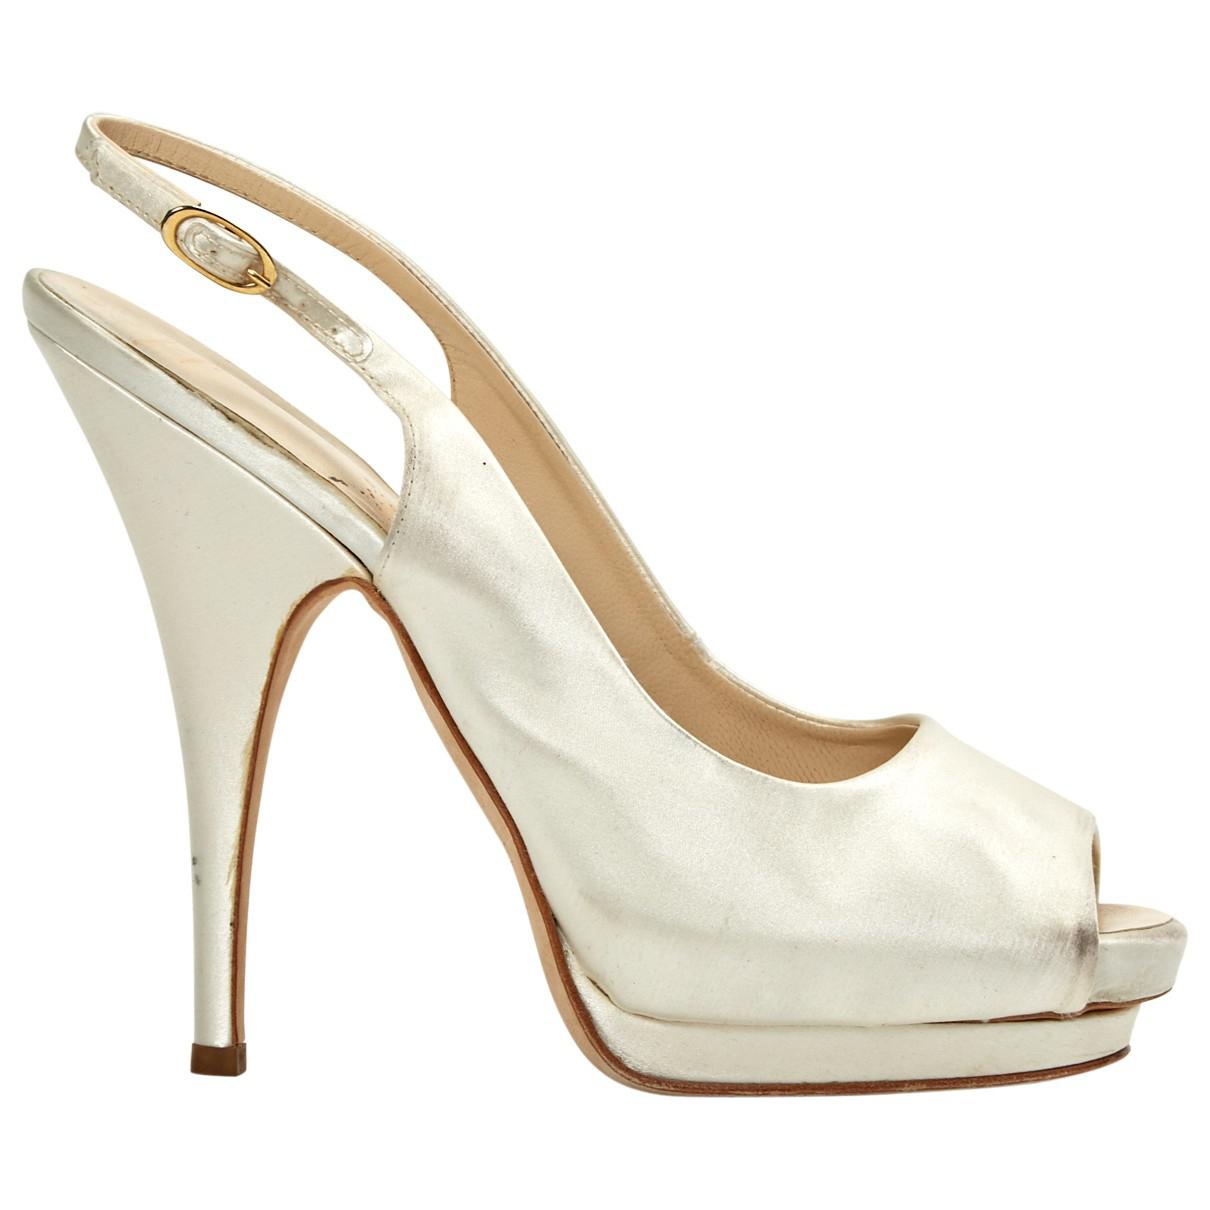 6bbbff4cf0 Giuseppe Zanotti. Women's Pre-owned Cloth Heels